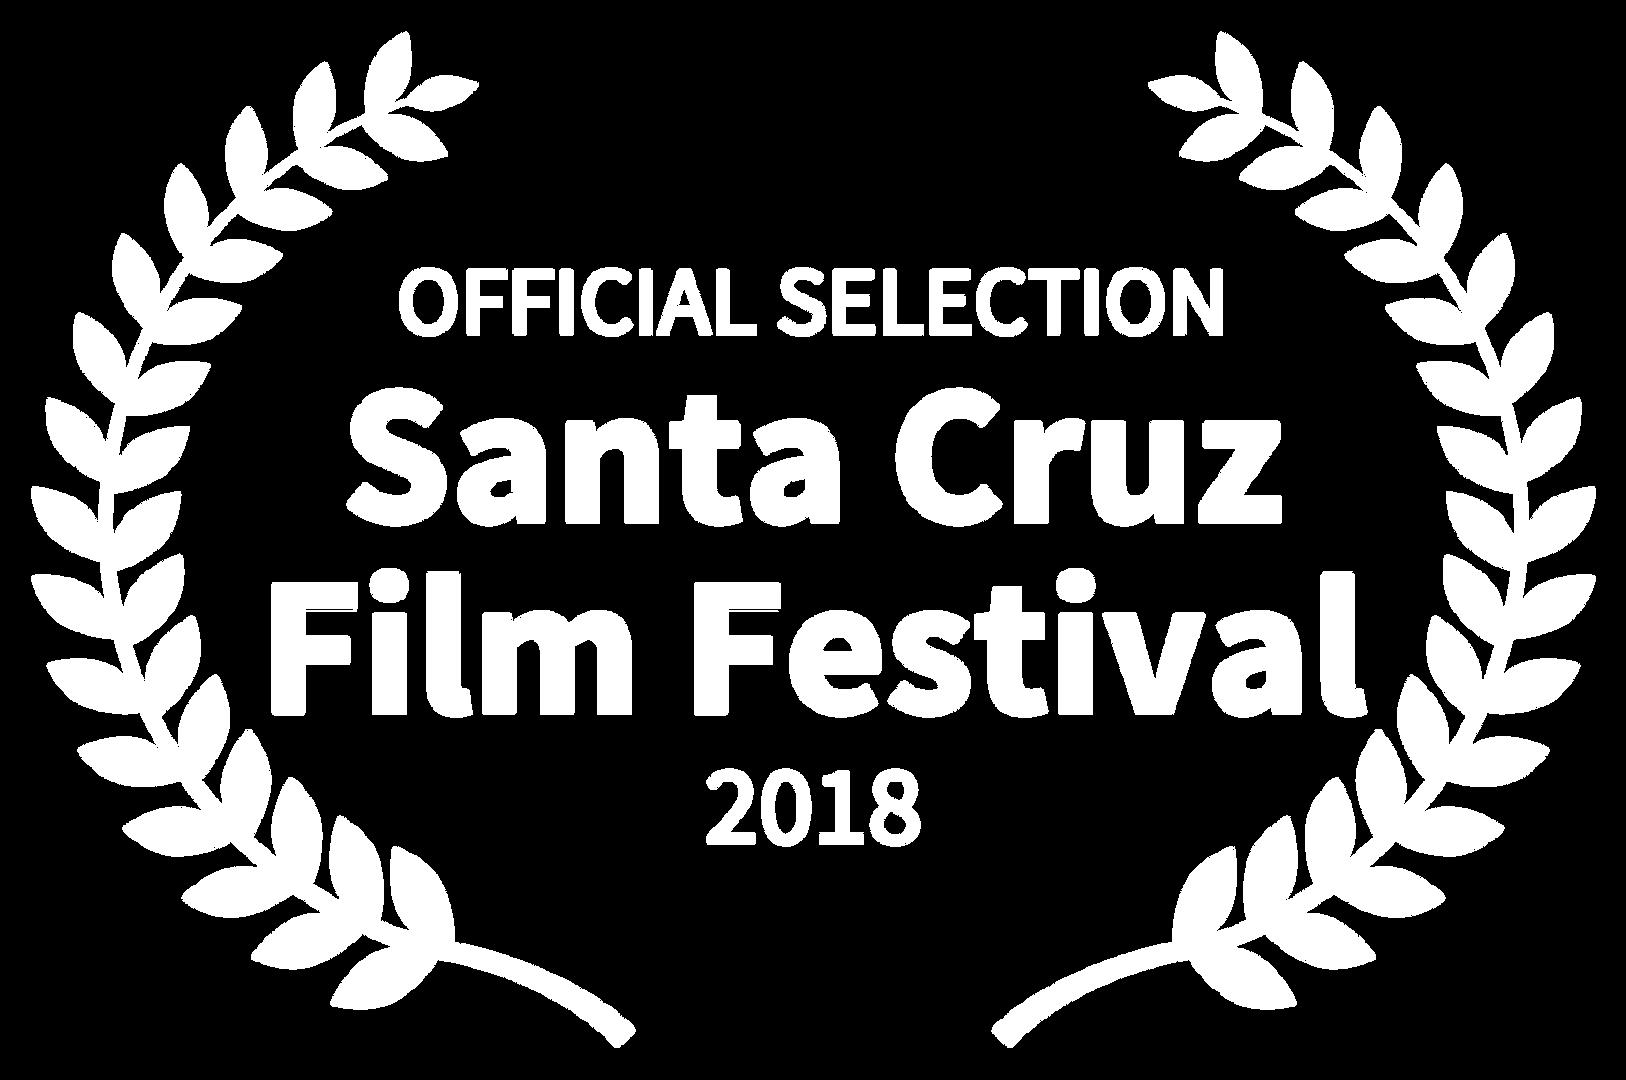 OFFICIAL SELECTION - Santa Cruz Film Fes